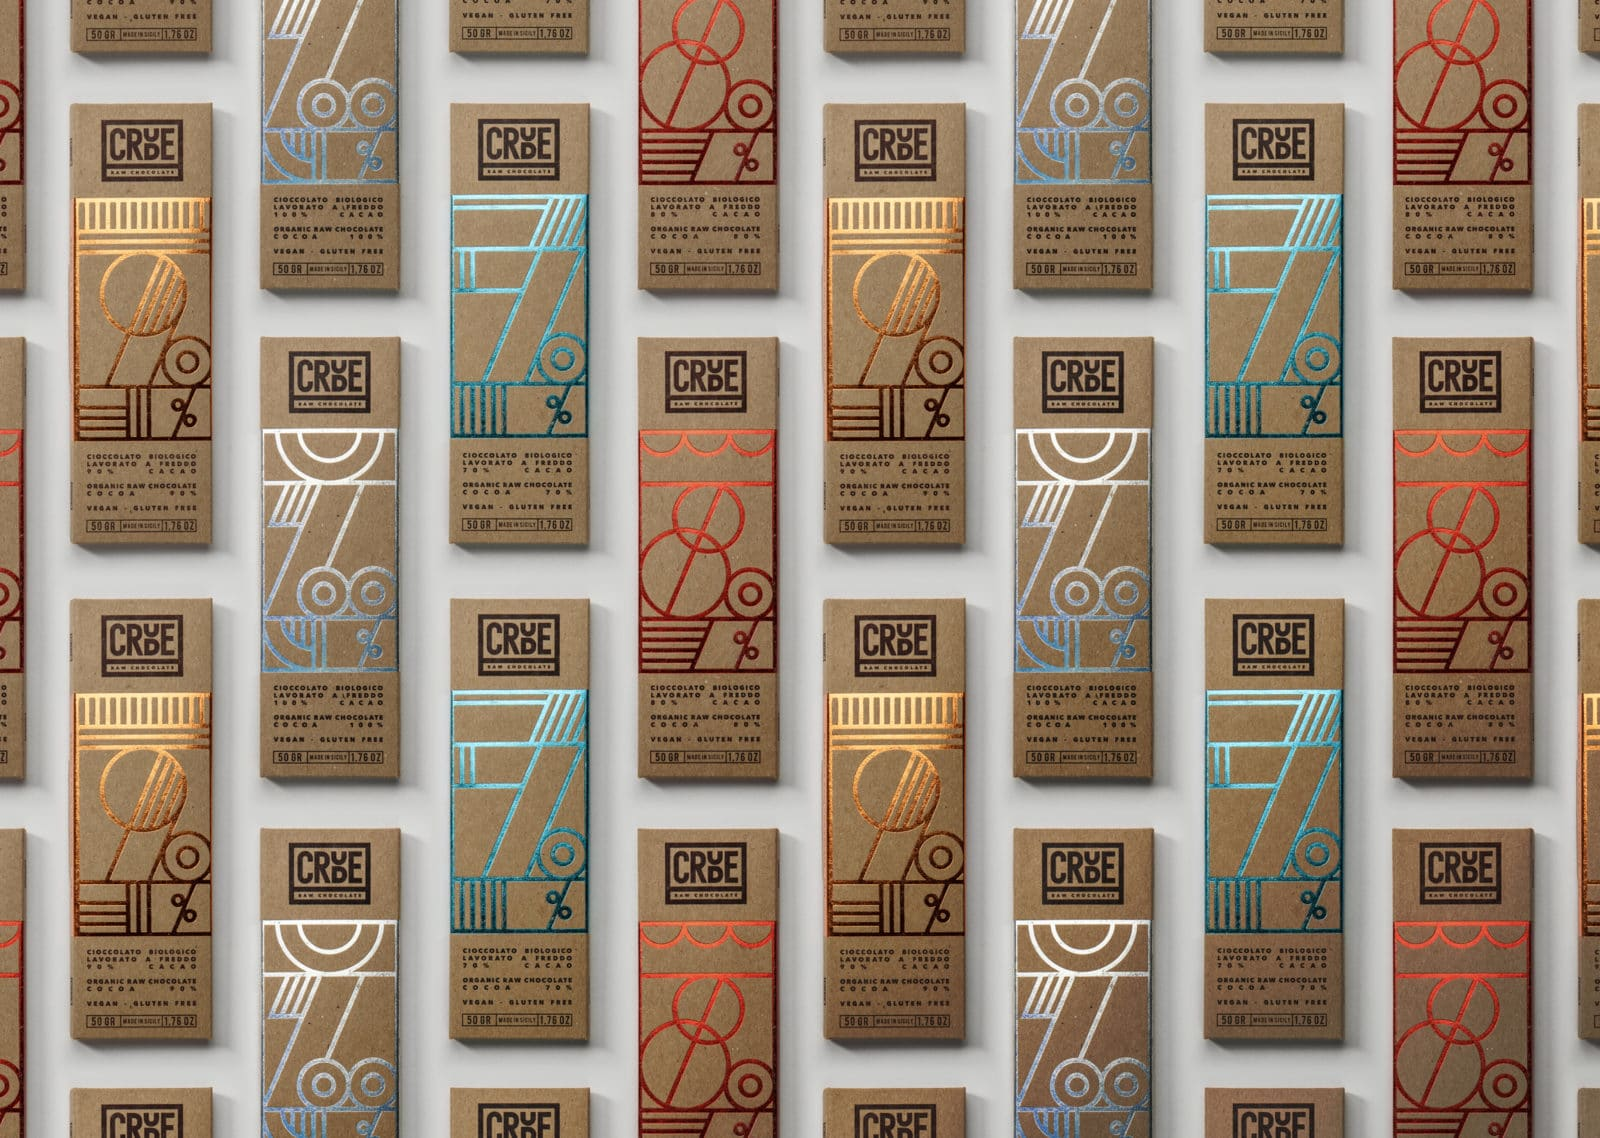 cioccolato crudo copertina